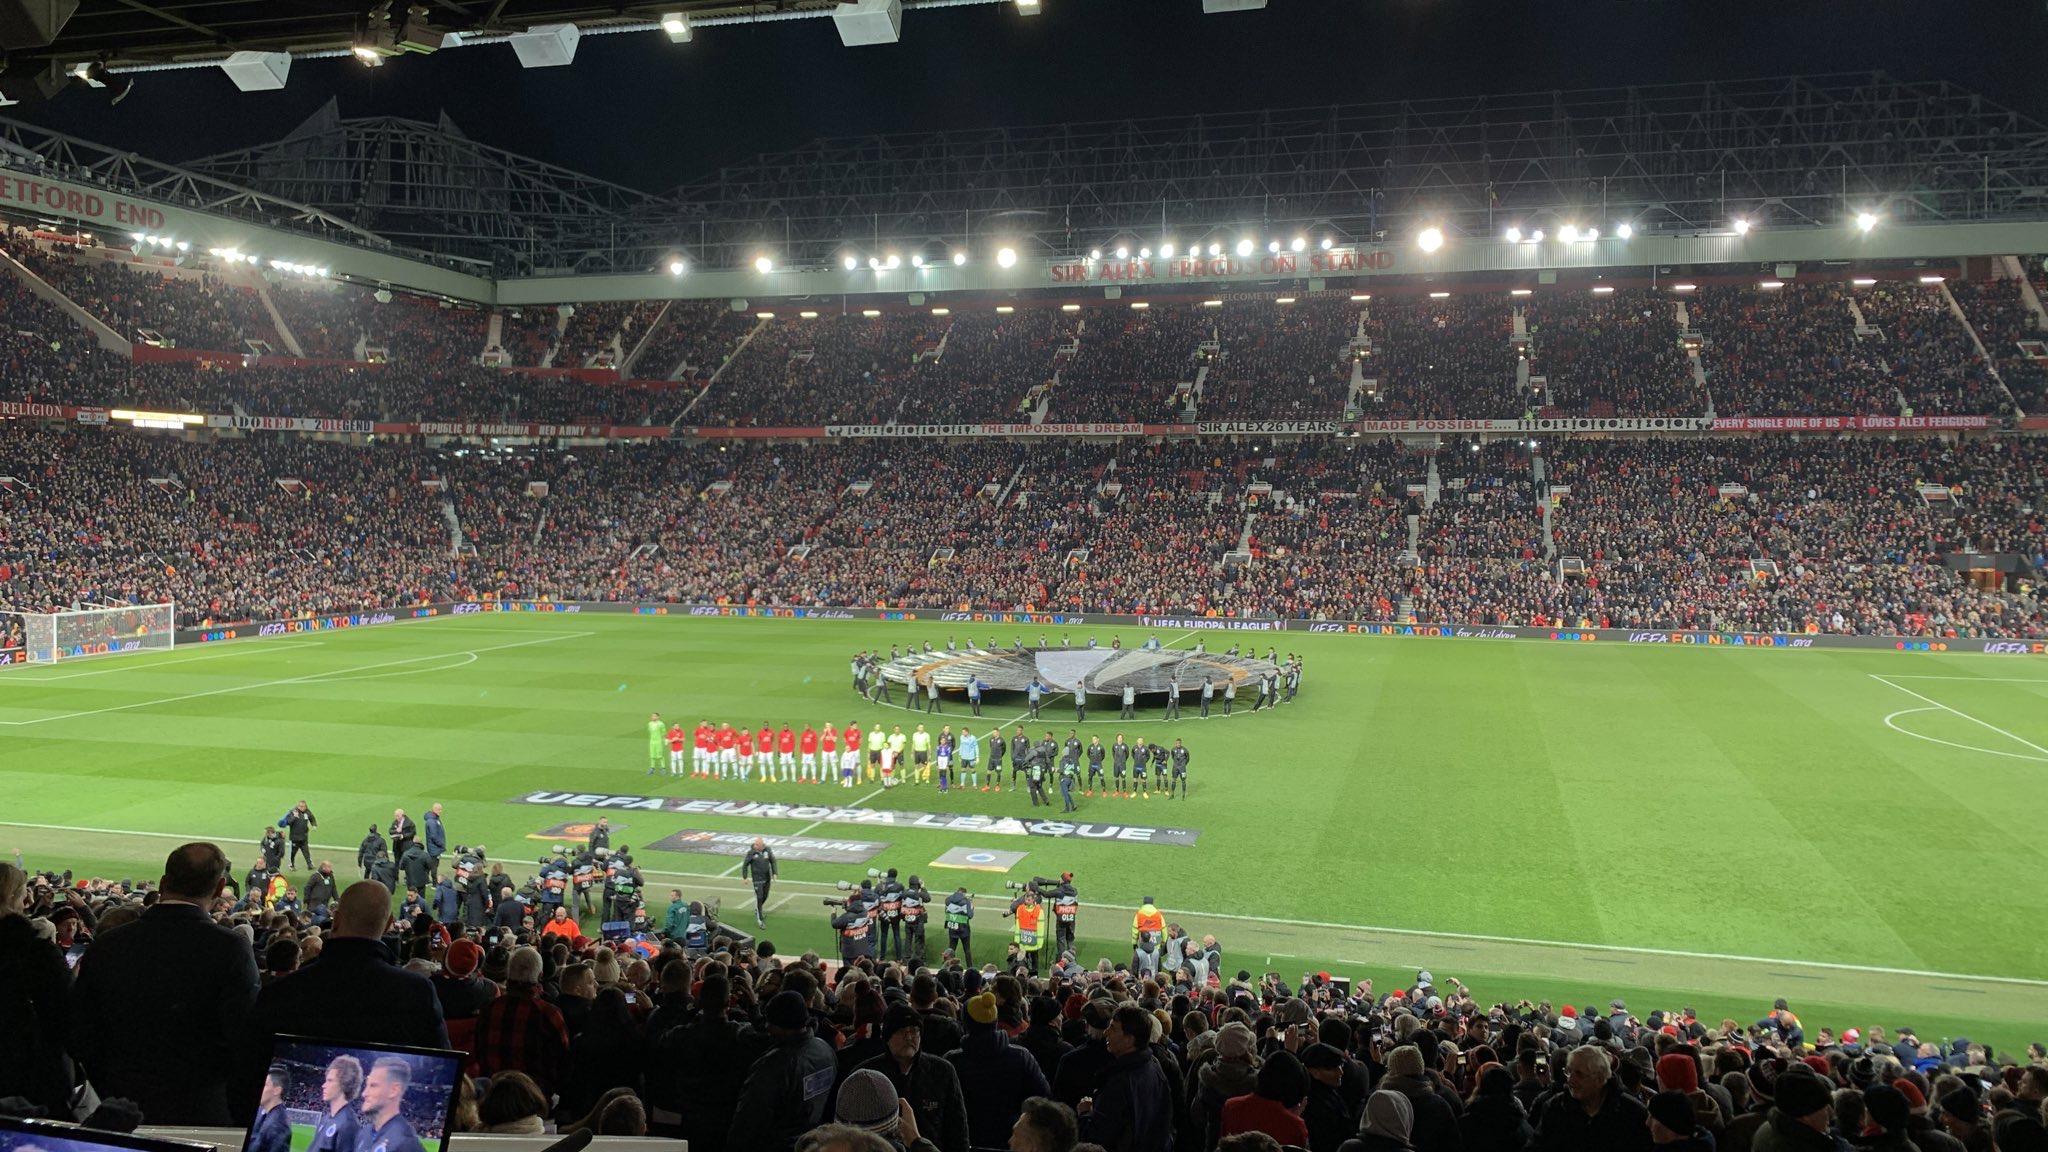 Old Trafford stadium, Manchester United, Europa League